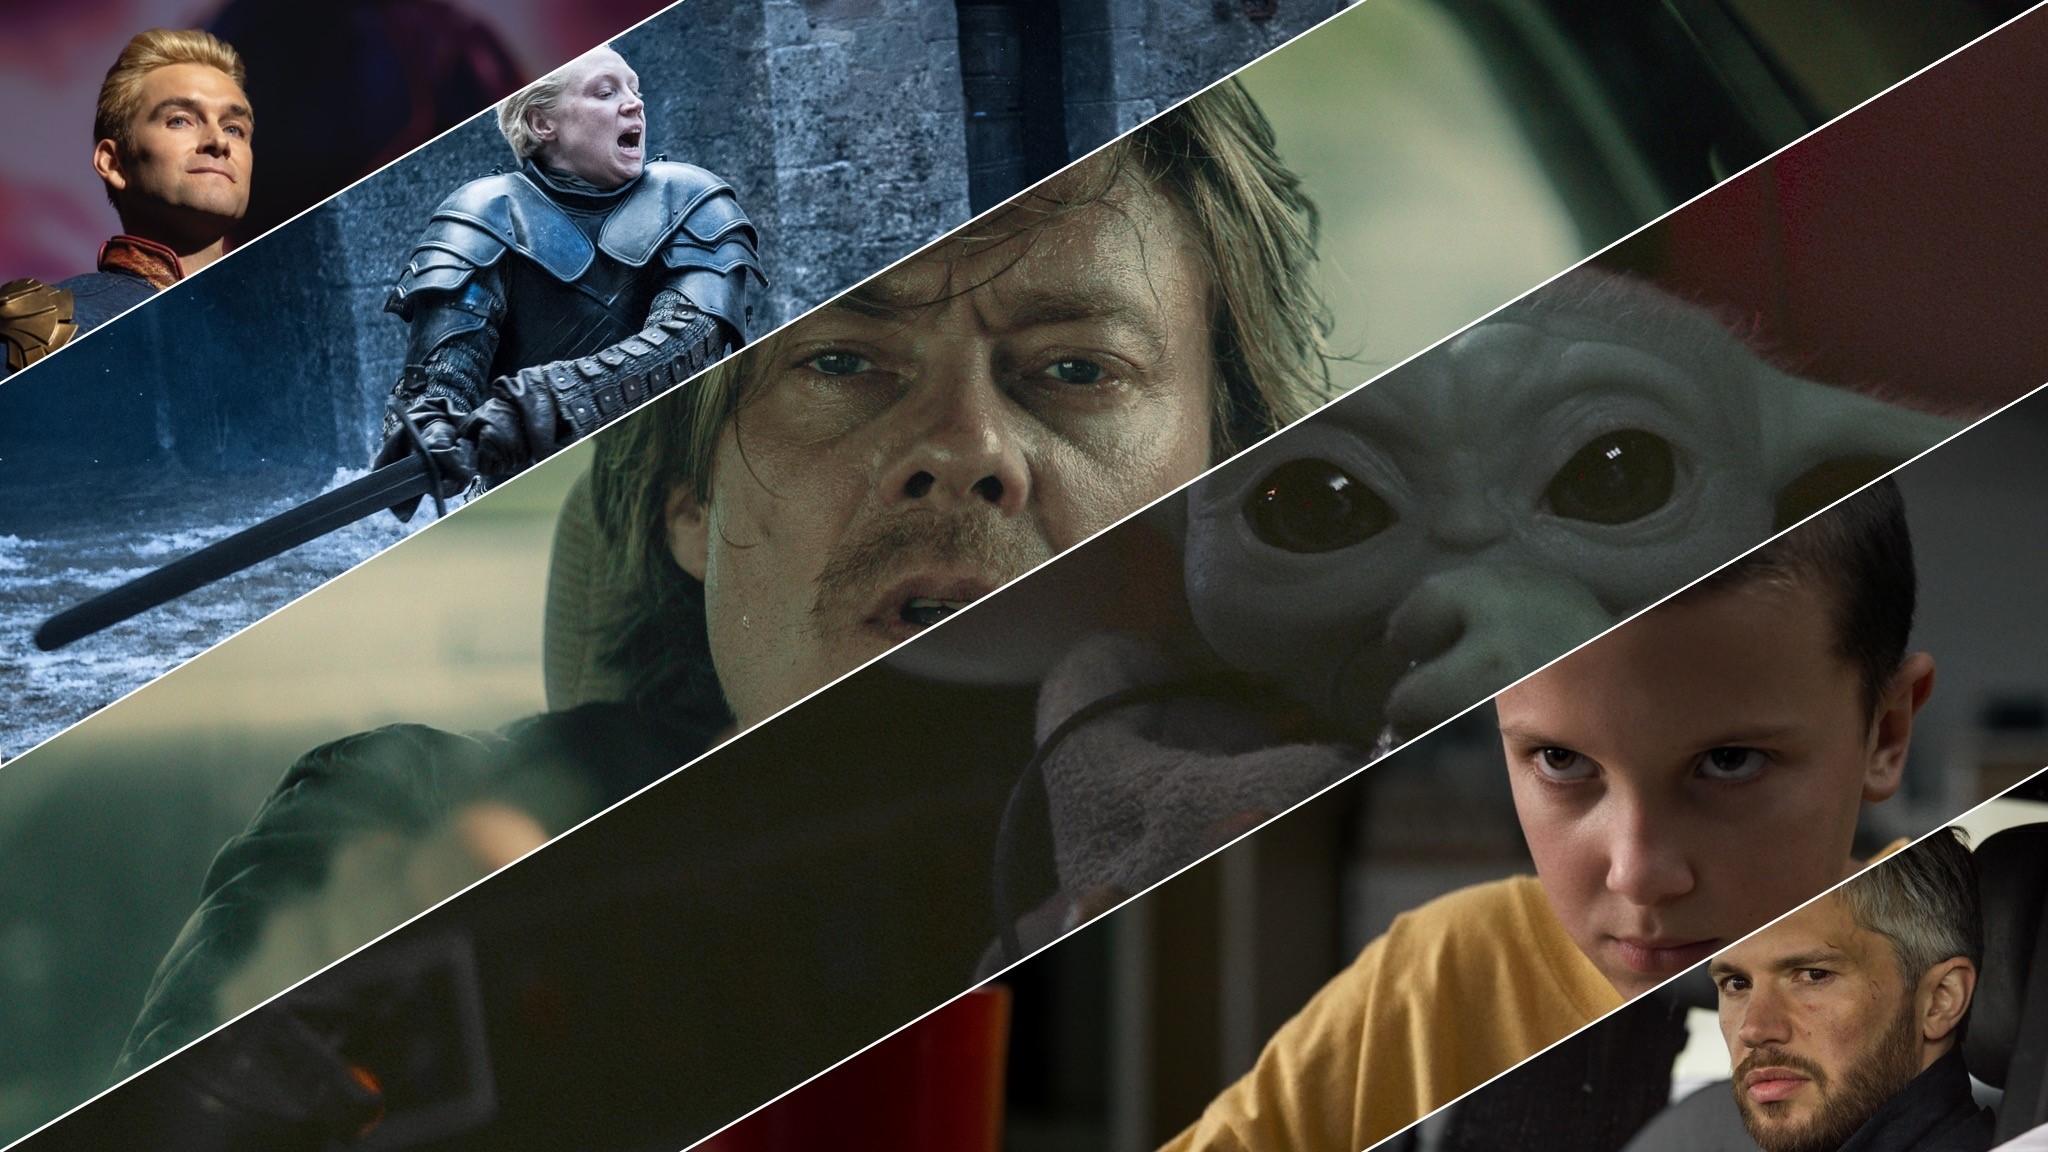 https://p3.no/filmpolitiet/wp-content/uploads/2020/09/collage.jpg